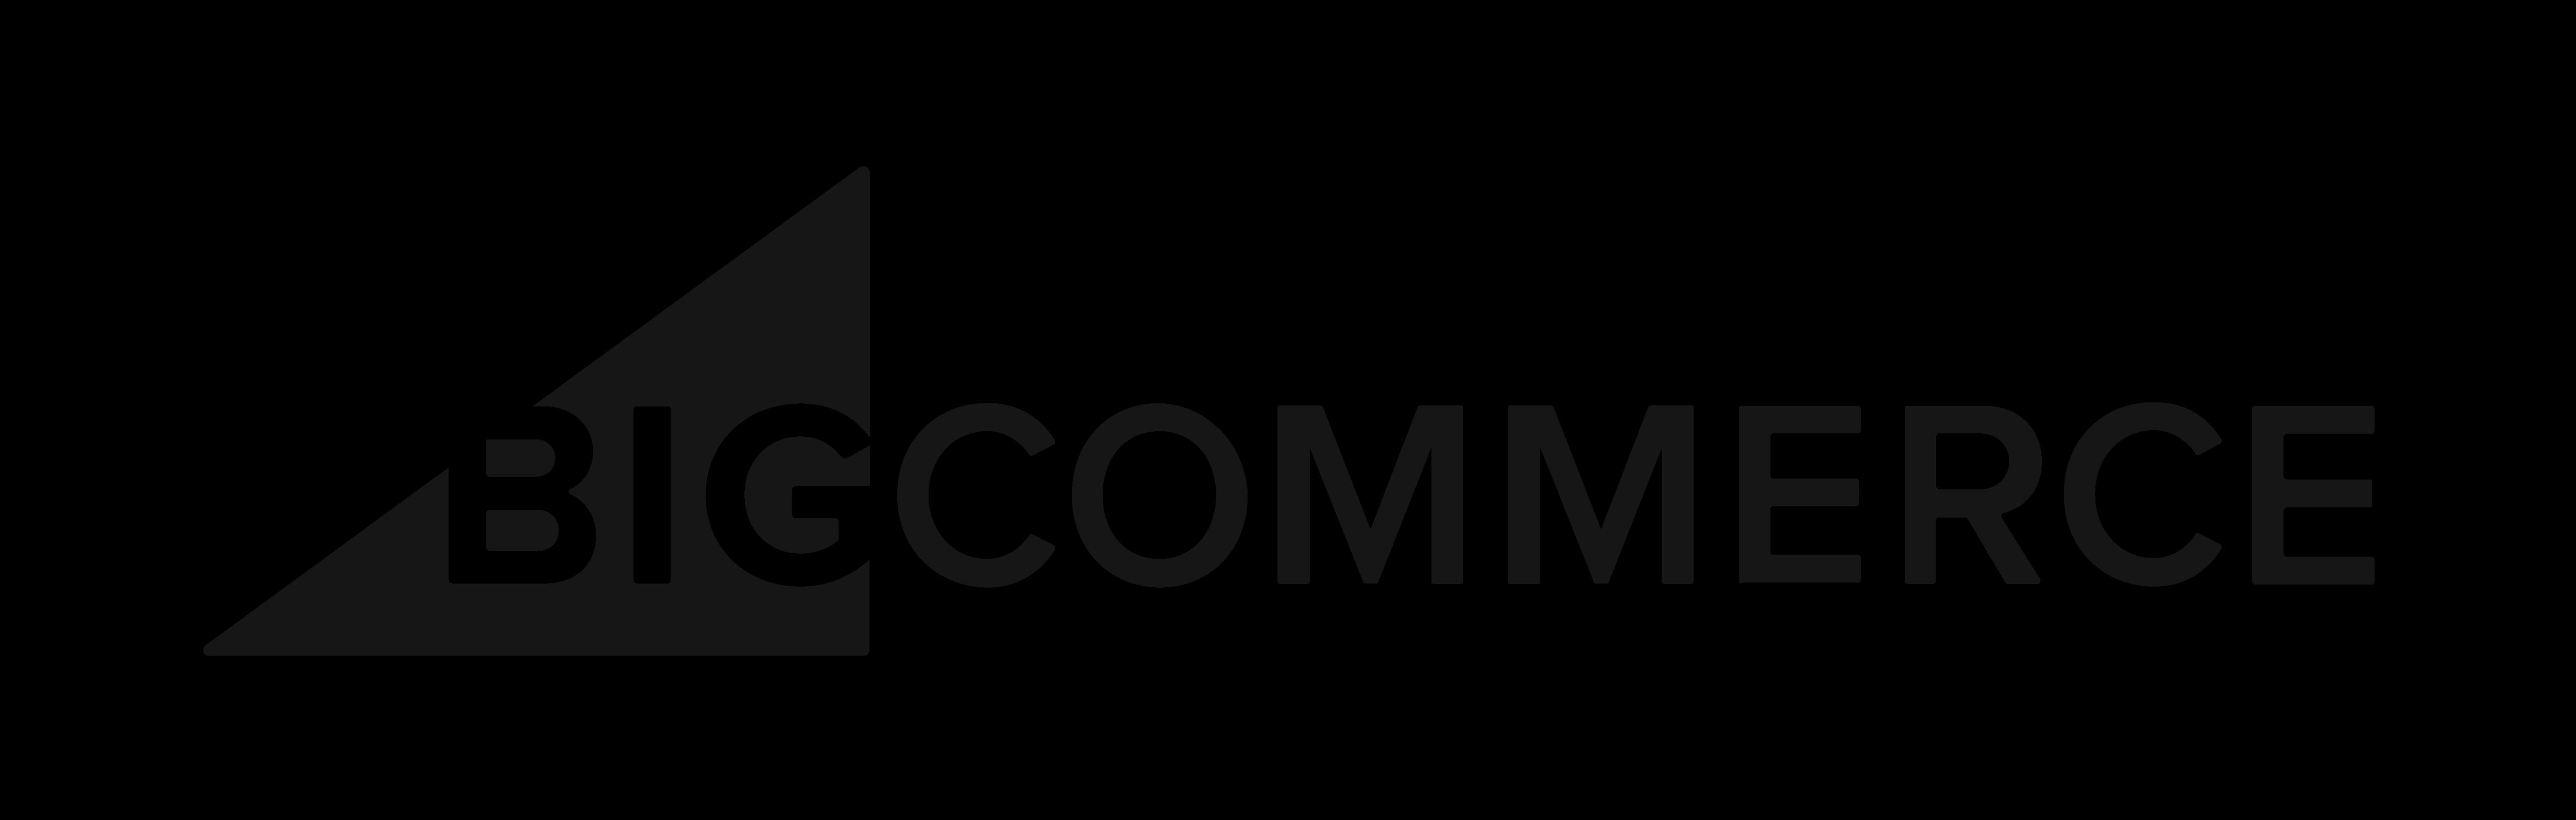 company-logos_BigCommerce